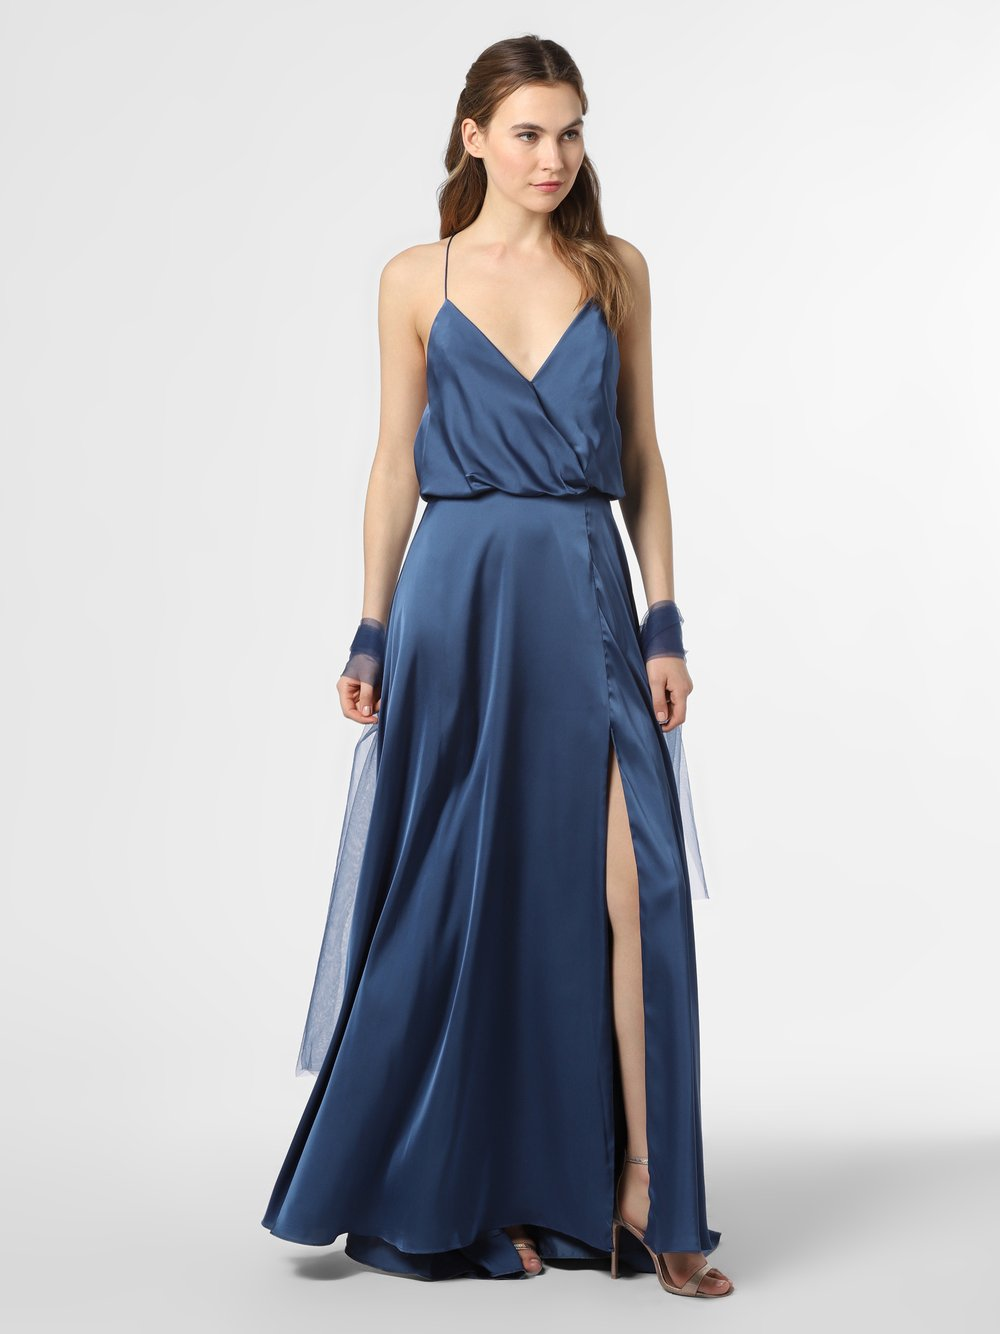 Unique – Damska sukienka wieczorowa, niebieski Van Graaf 386106-0007-00360